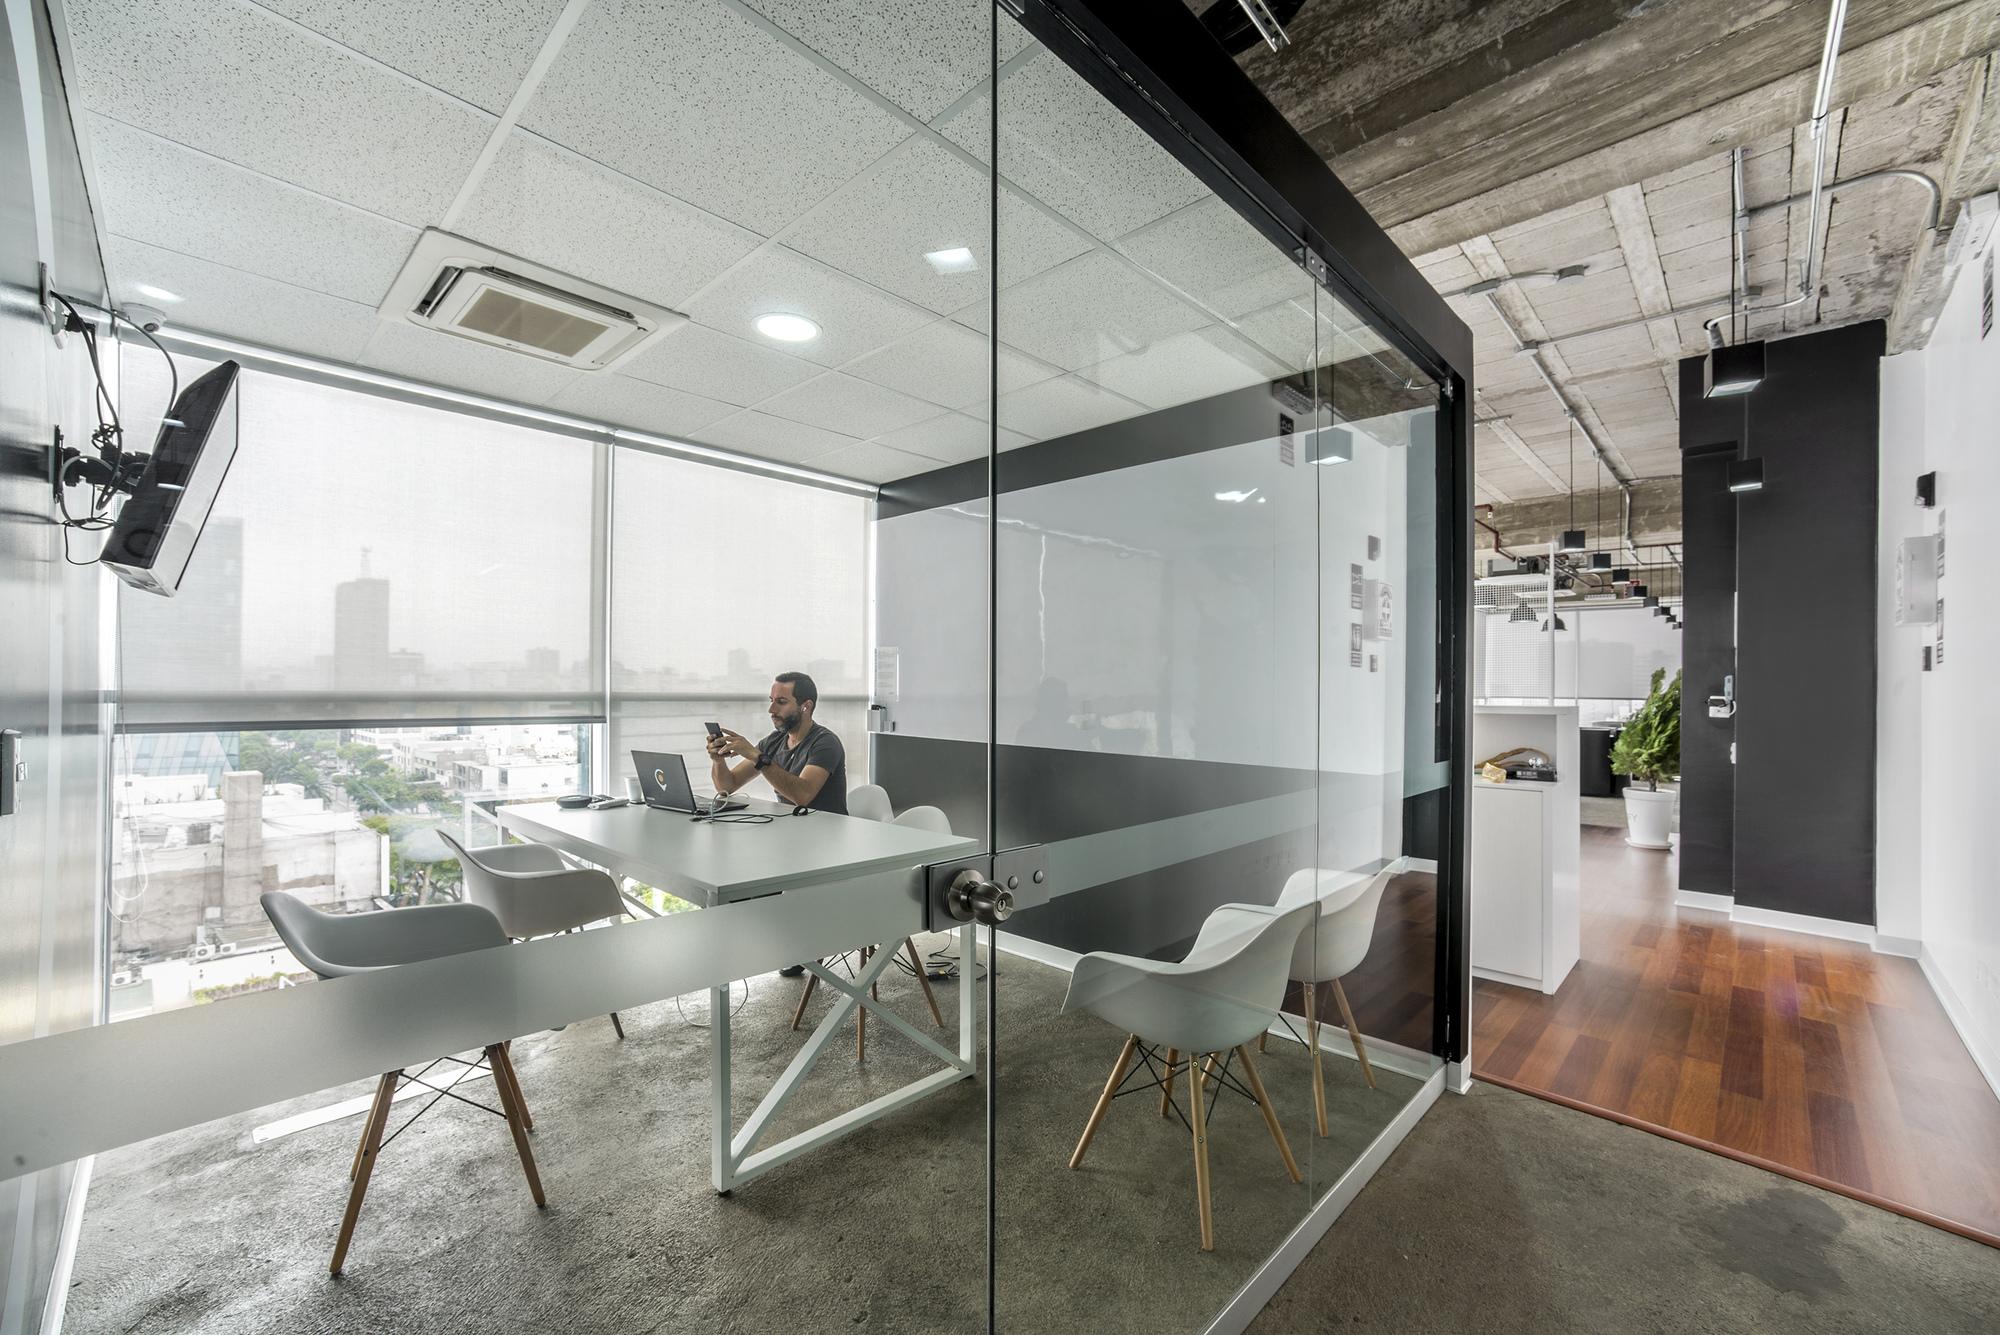 galer a de oficinas cabify tru arquitectos 10